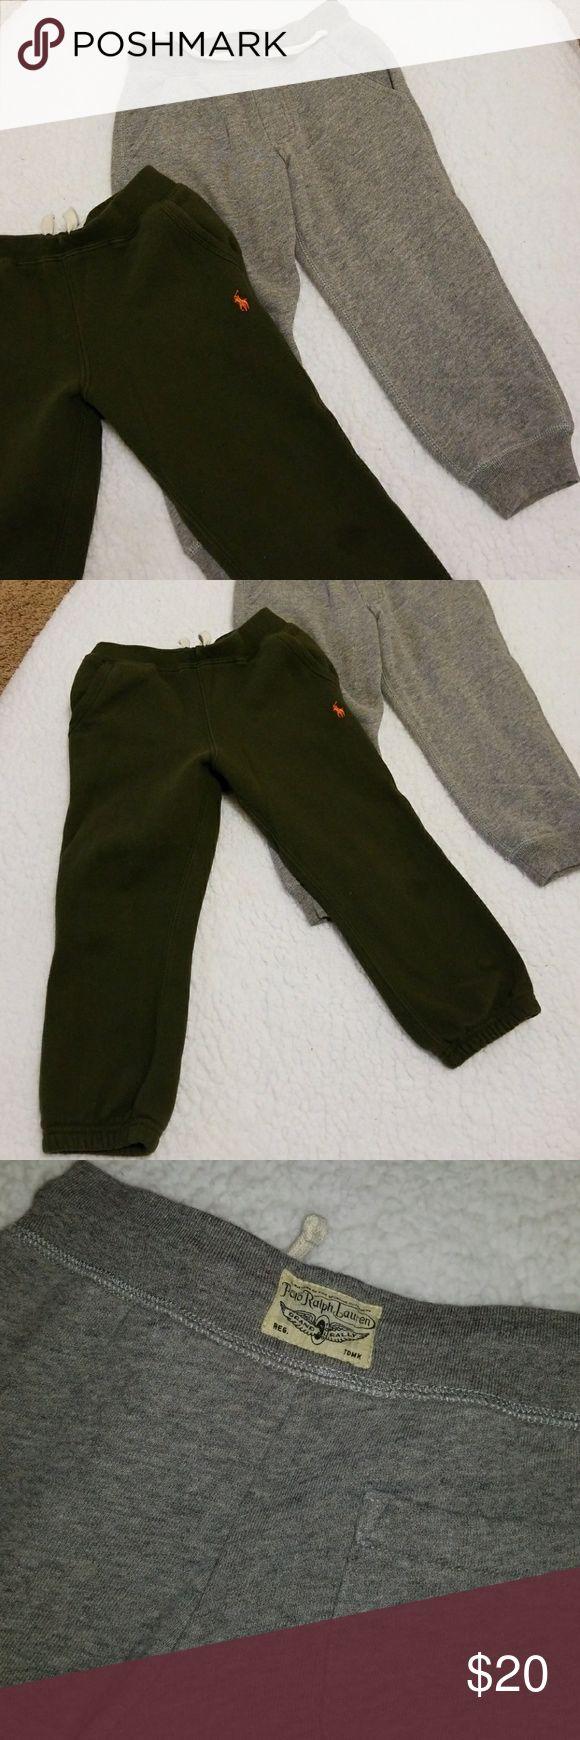 2 Polo sweatpants Nice warm RL bottoms. Army green & grey. Drawstring adjustable. Polo by Ralph Lauren Bottoms Sweatpants & Joggers